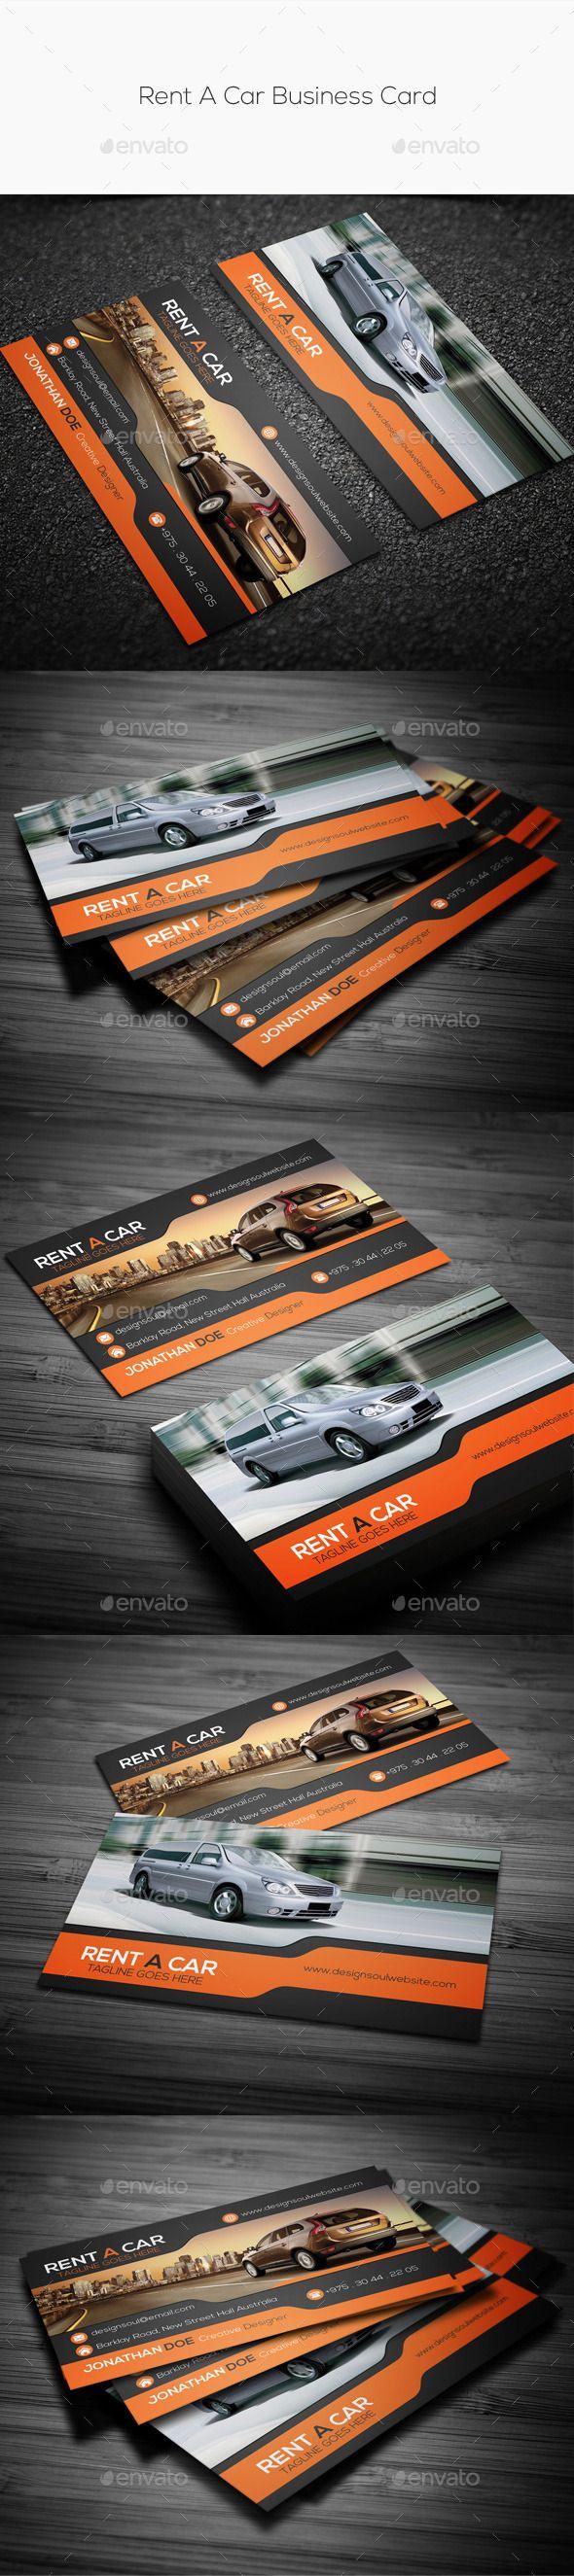 Rent A Car Business Card Template #design Download: http://graphicriver.net/item/rent-a-car-business-card/11052096?ref=ksioks